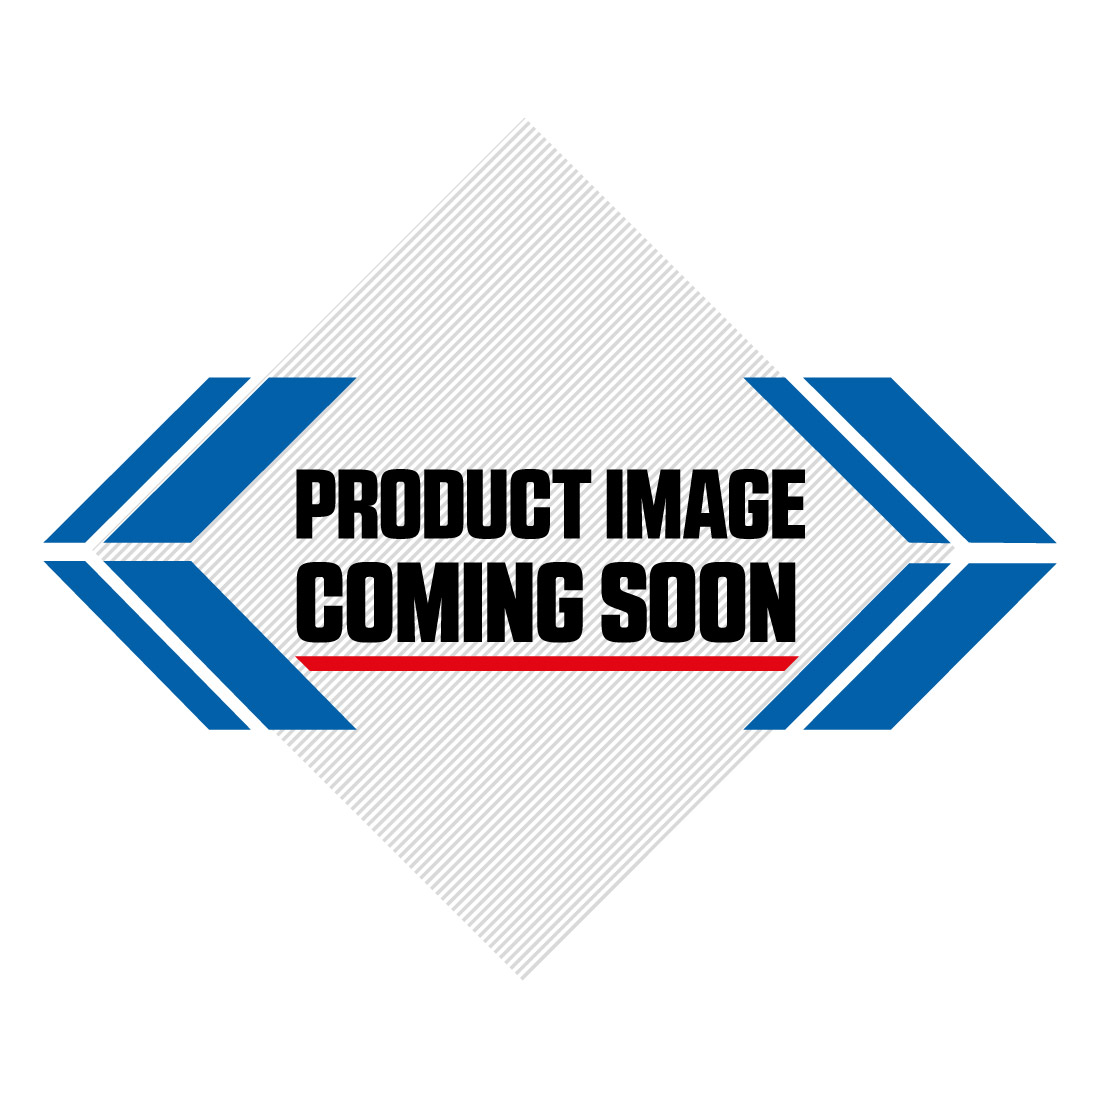 Honda Plastic Kit CRF 230 (15-20) OEM Factory Image-1>